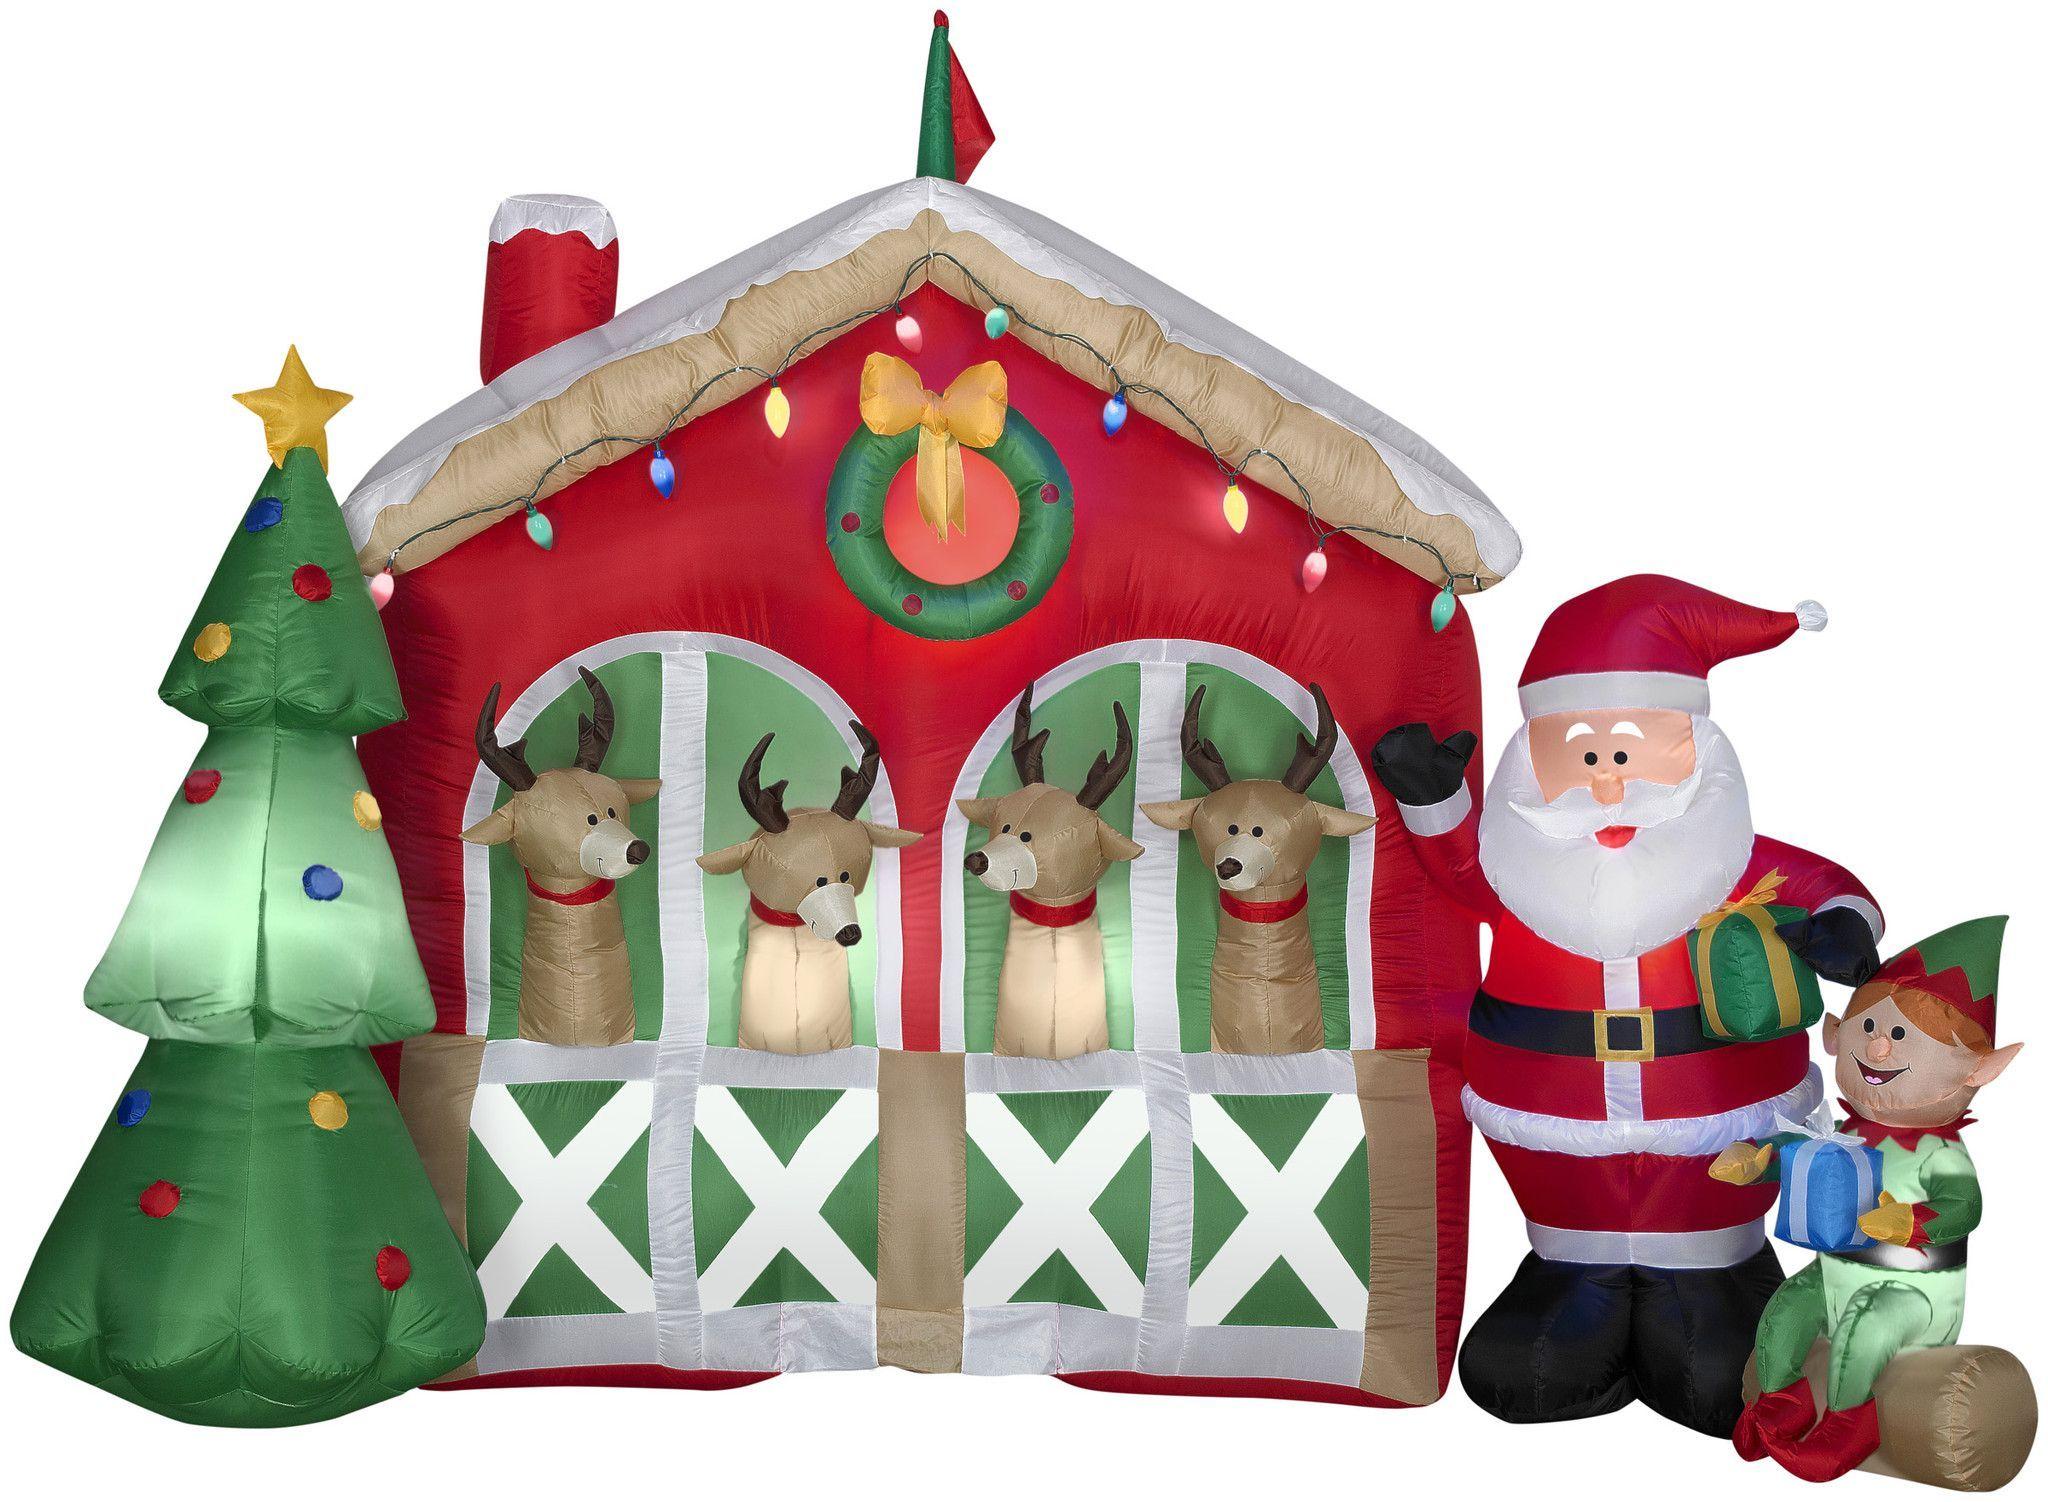 6 Airblown Reindeer Stable Scene Christmas Inflatable